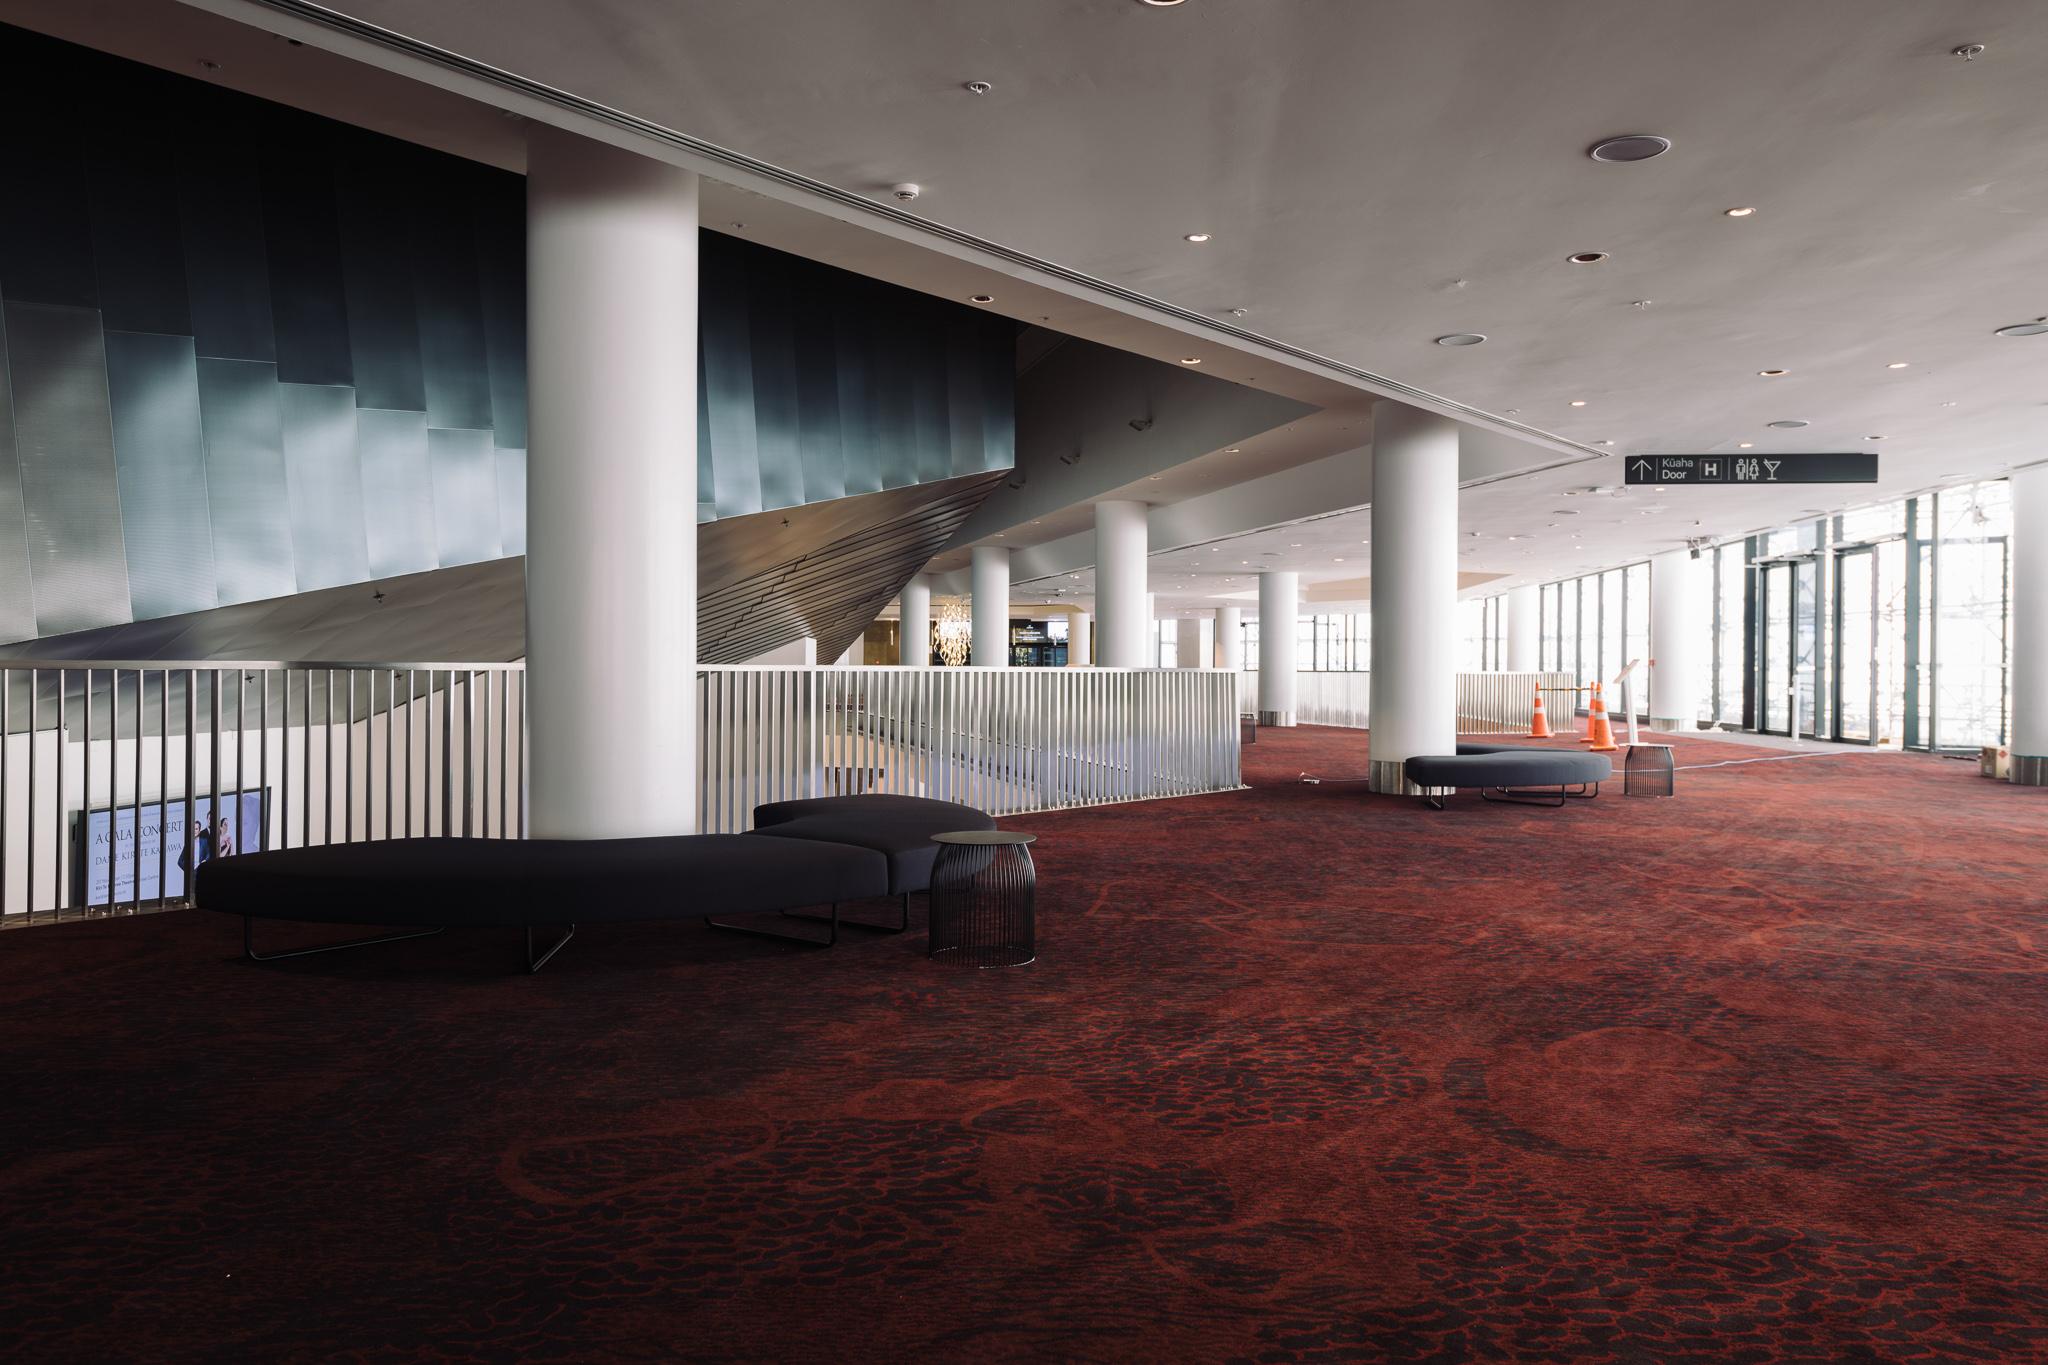 https://rfacdn.nz/conventions/assets/media/aotea-centre-level-5-air-new-zealand-balcony-foyer-10.jpg